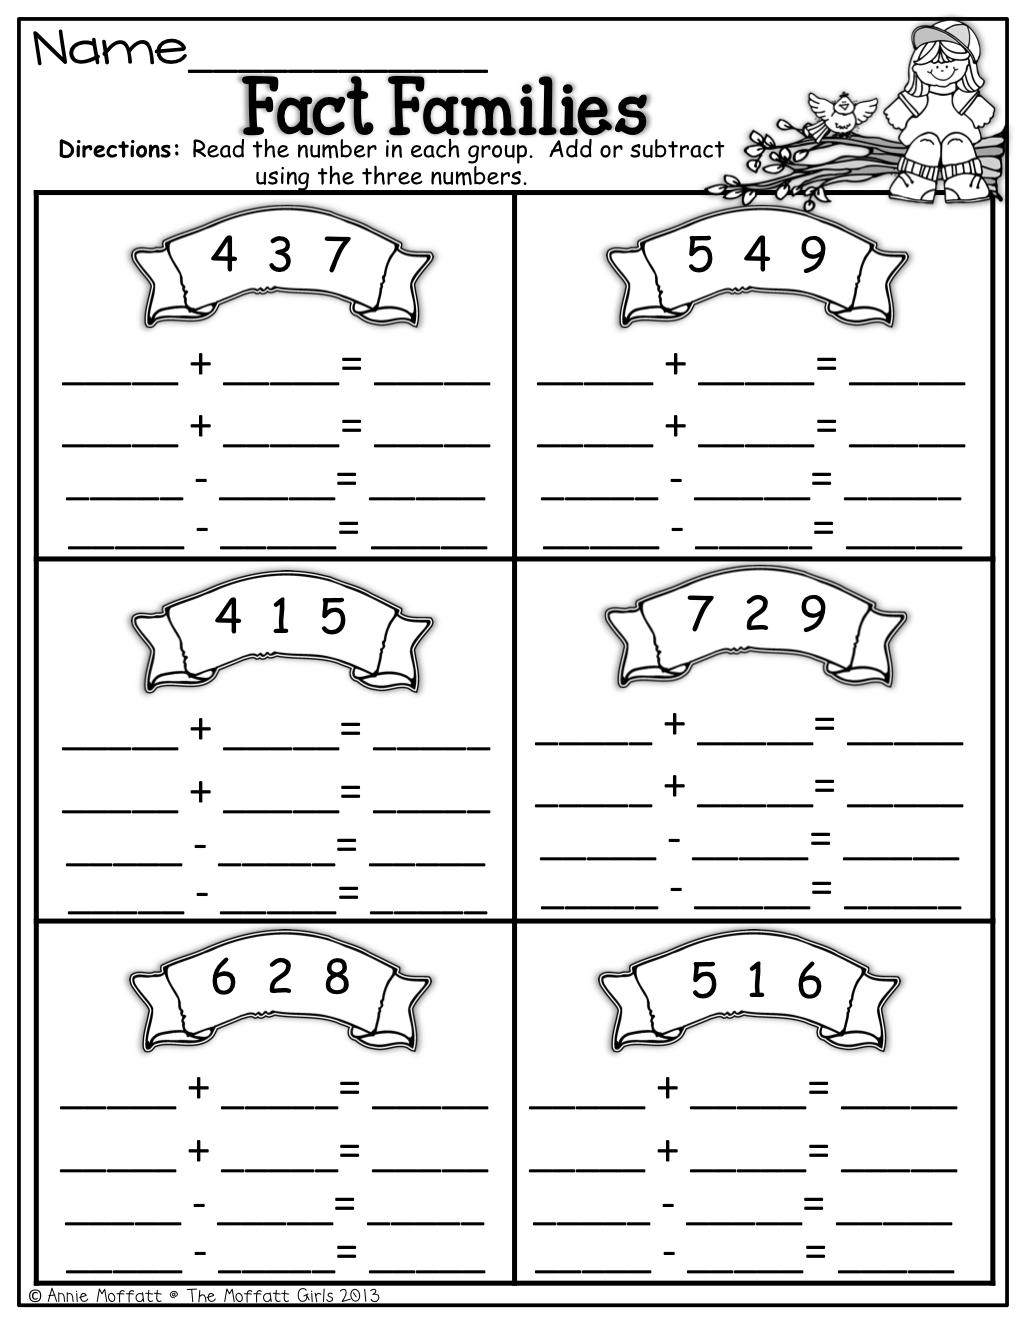 Kindergarten Multiplication Fact Family Worksheets 3Rd Grade Free ...